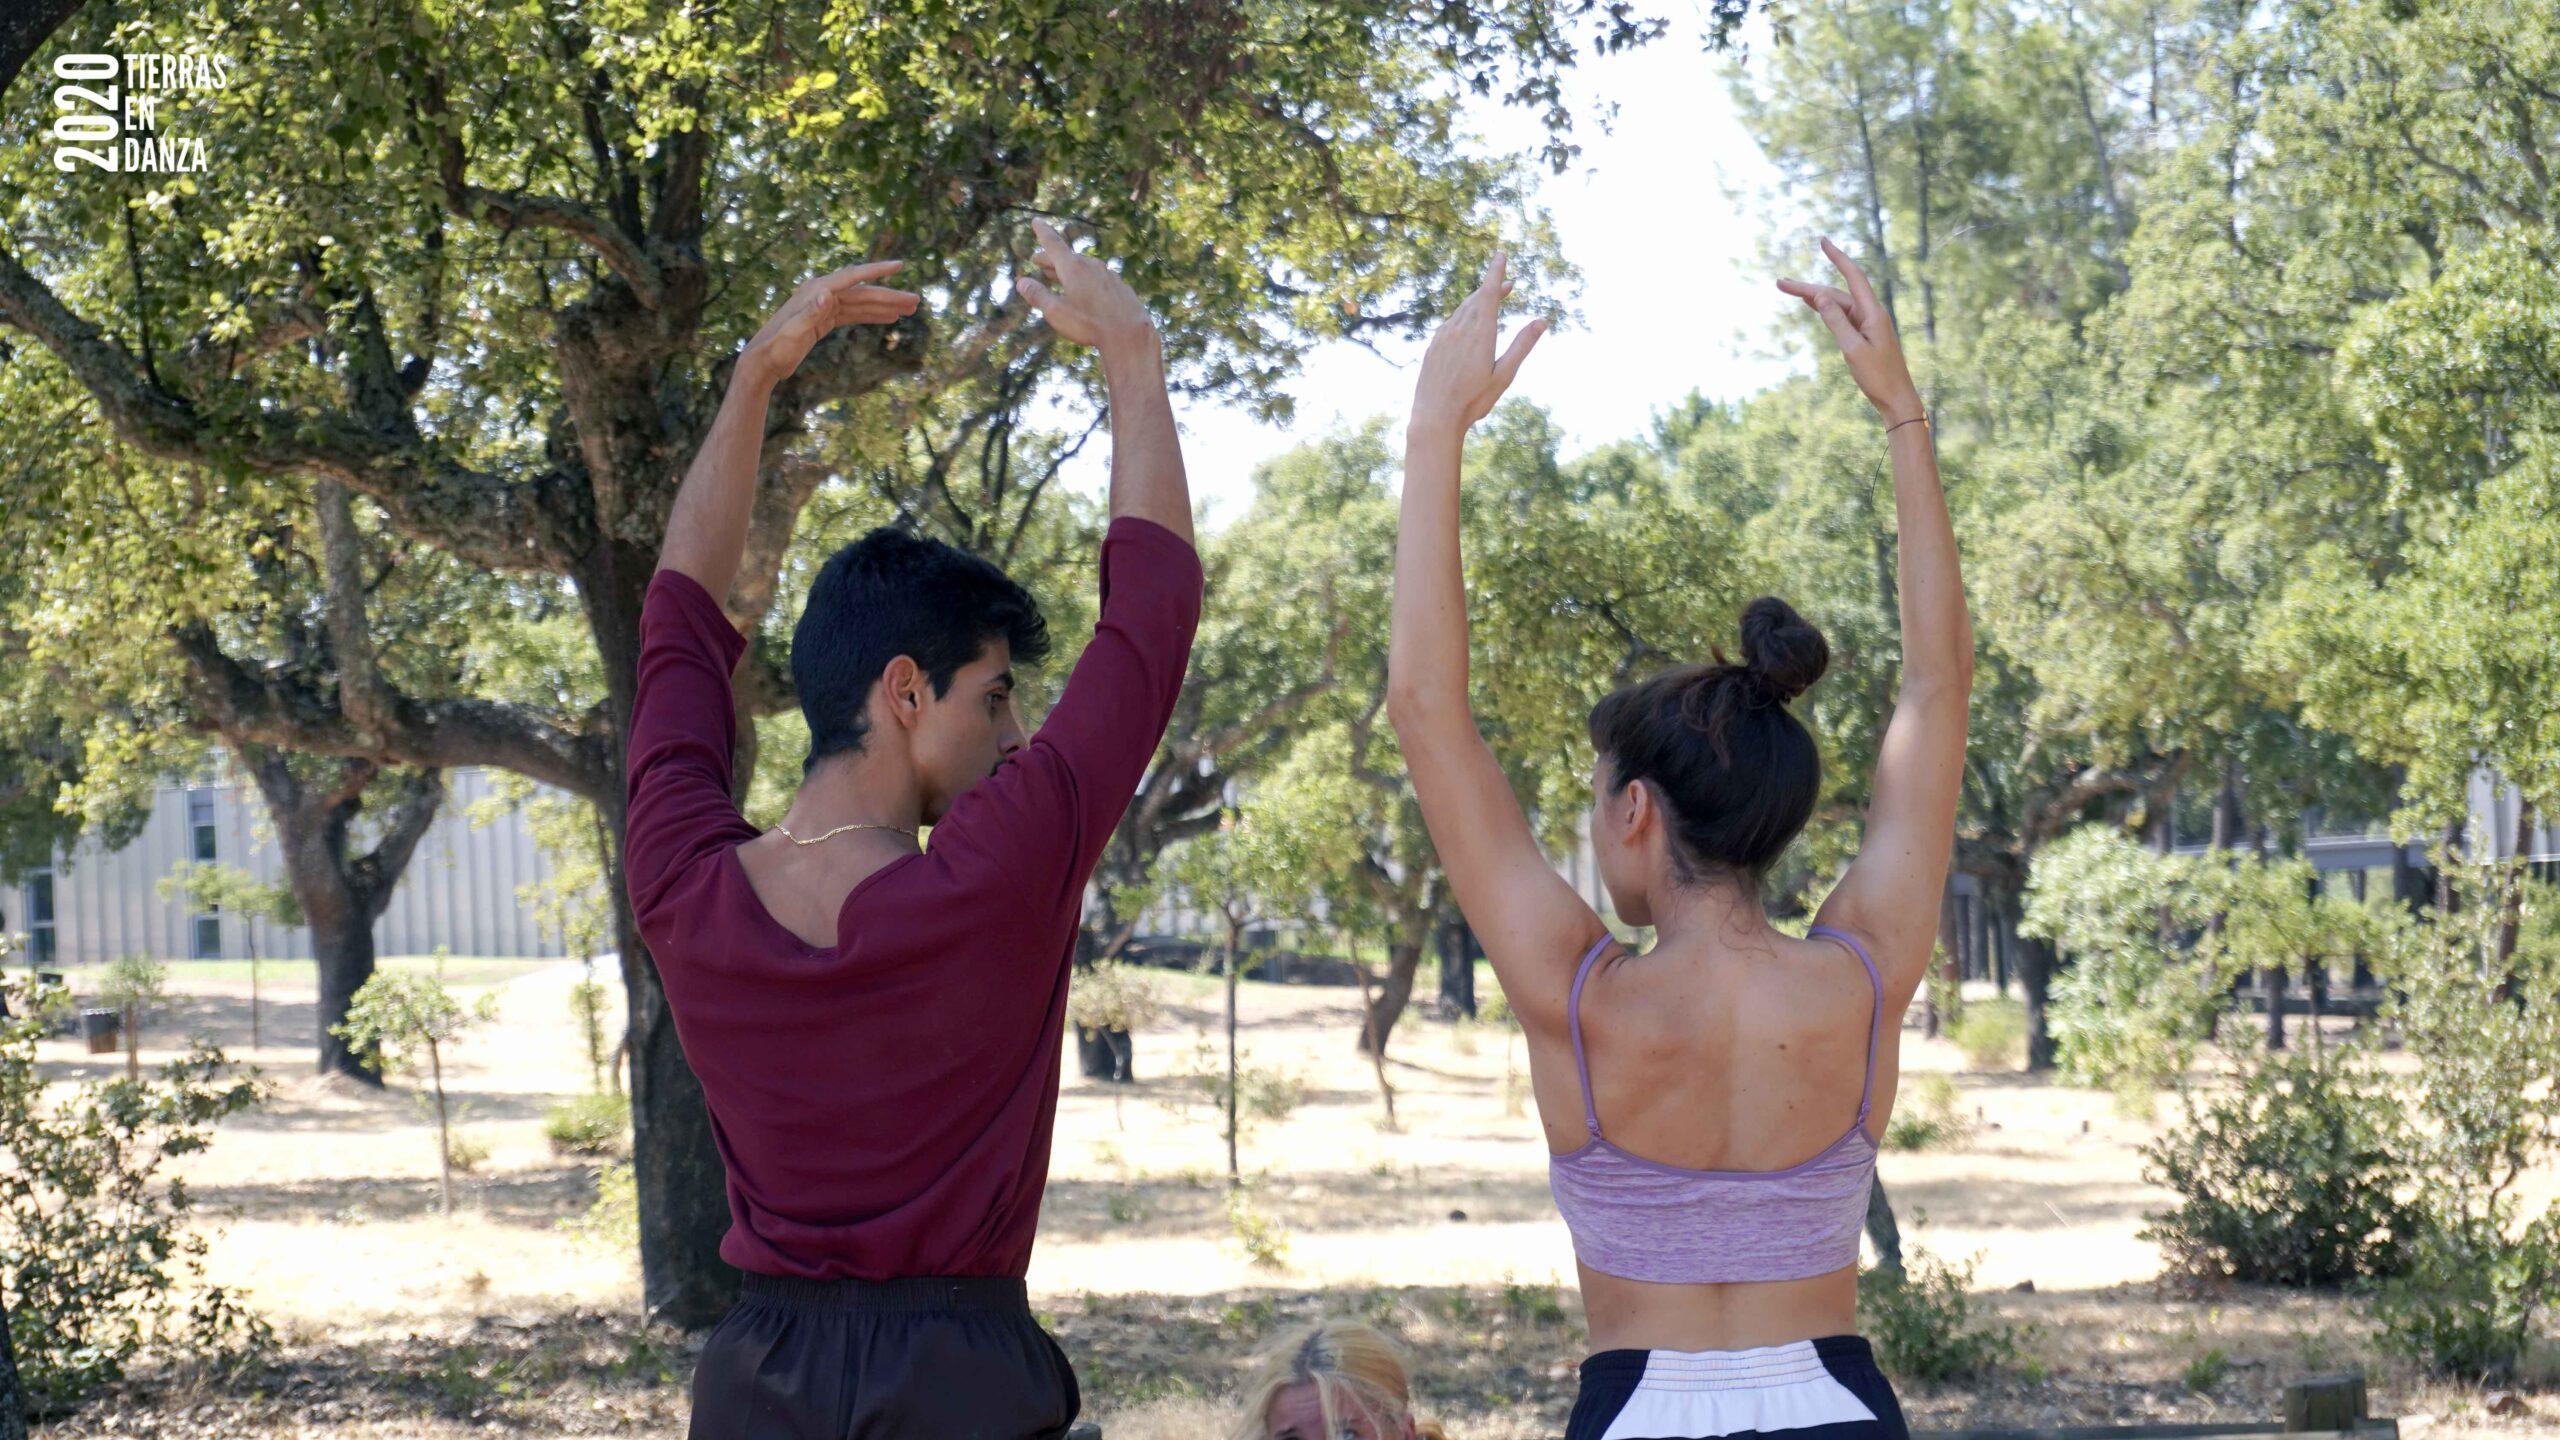 Taller_diana_bonilla_tierras_en_danza